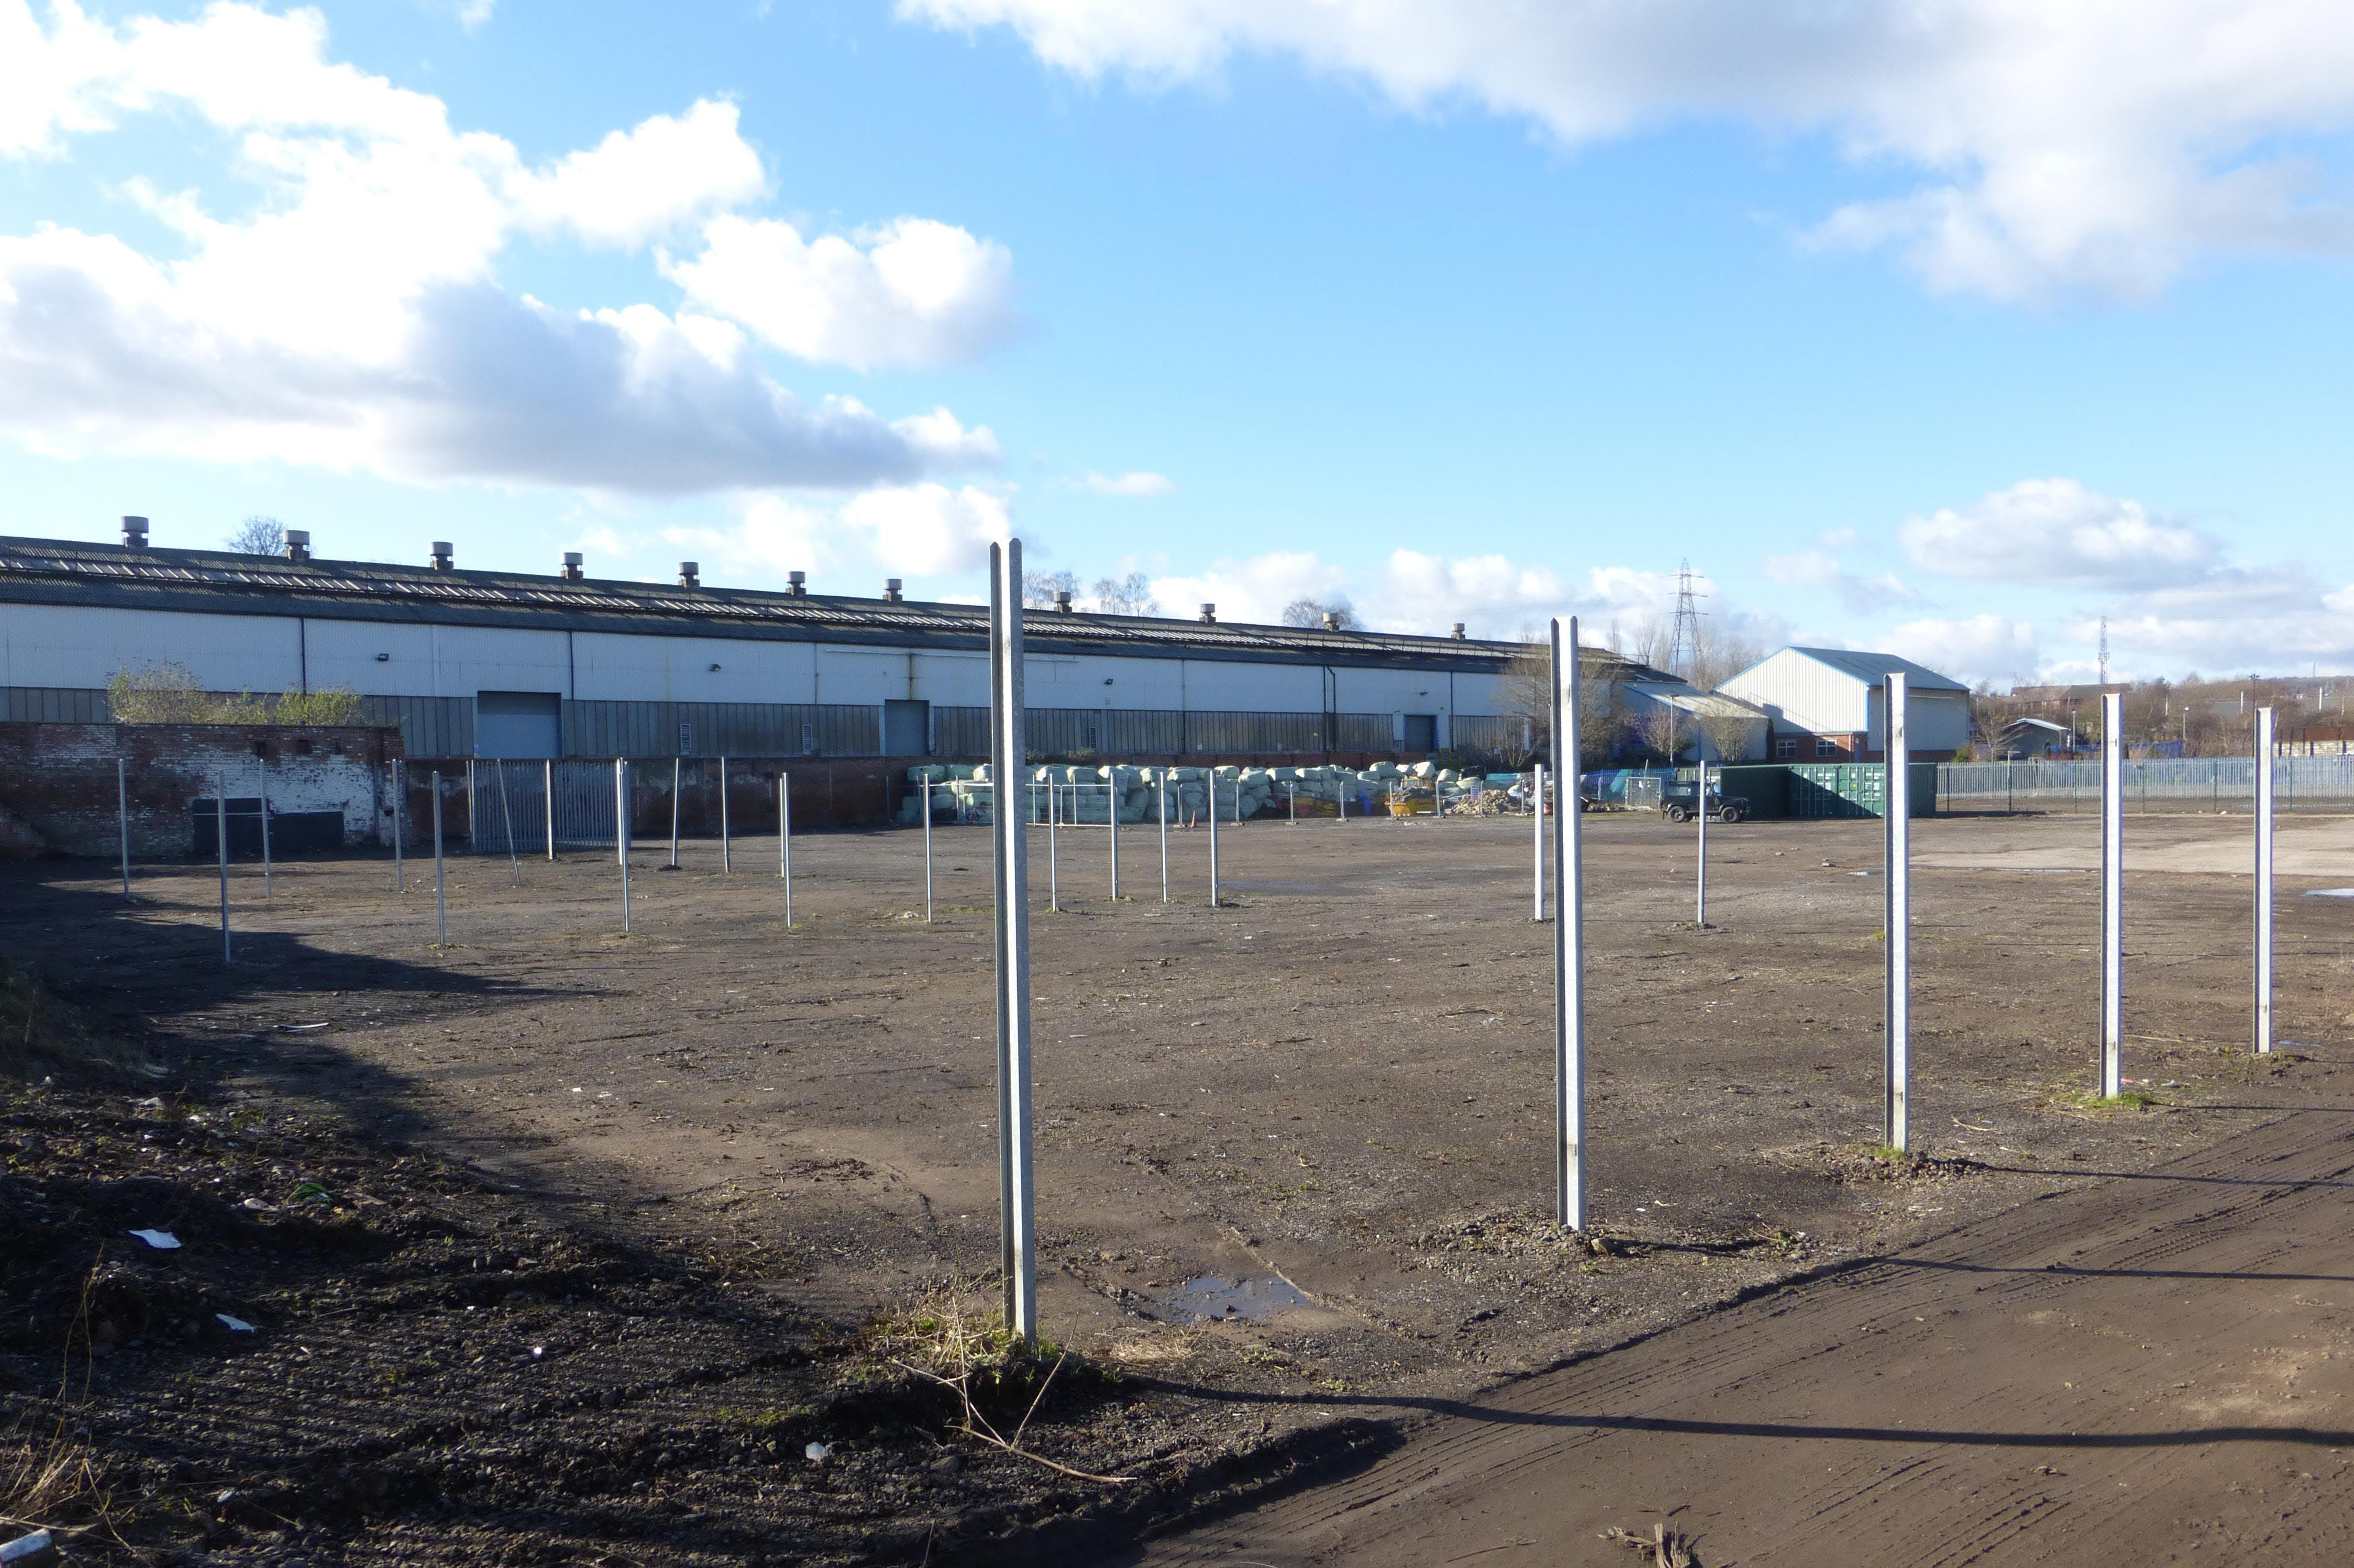 Darnall Works, Darnall Road, Sheffield, Development (Land & Buildings) / Open Storage Land For Sale - P1080344.JPG